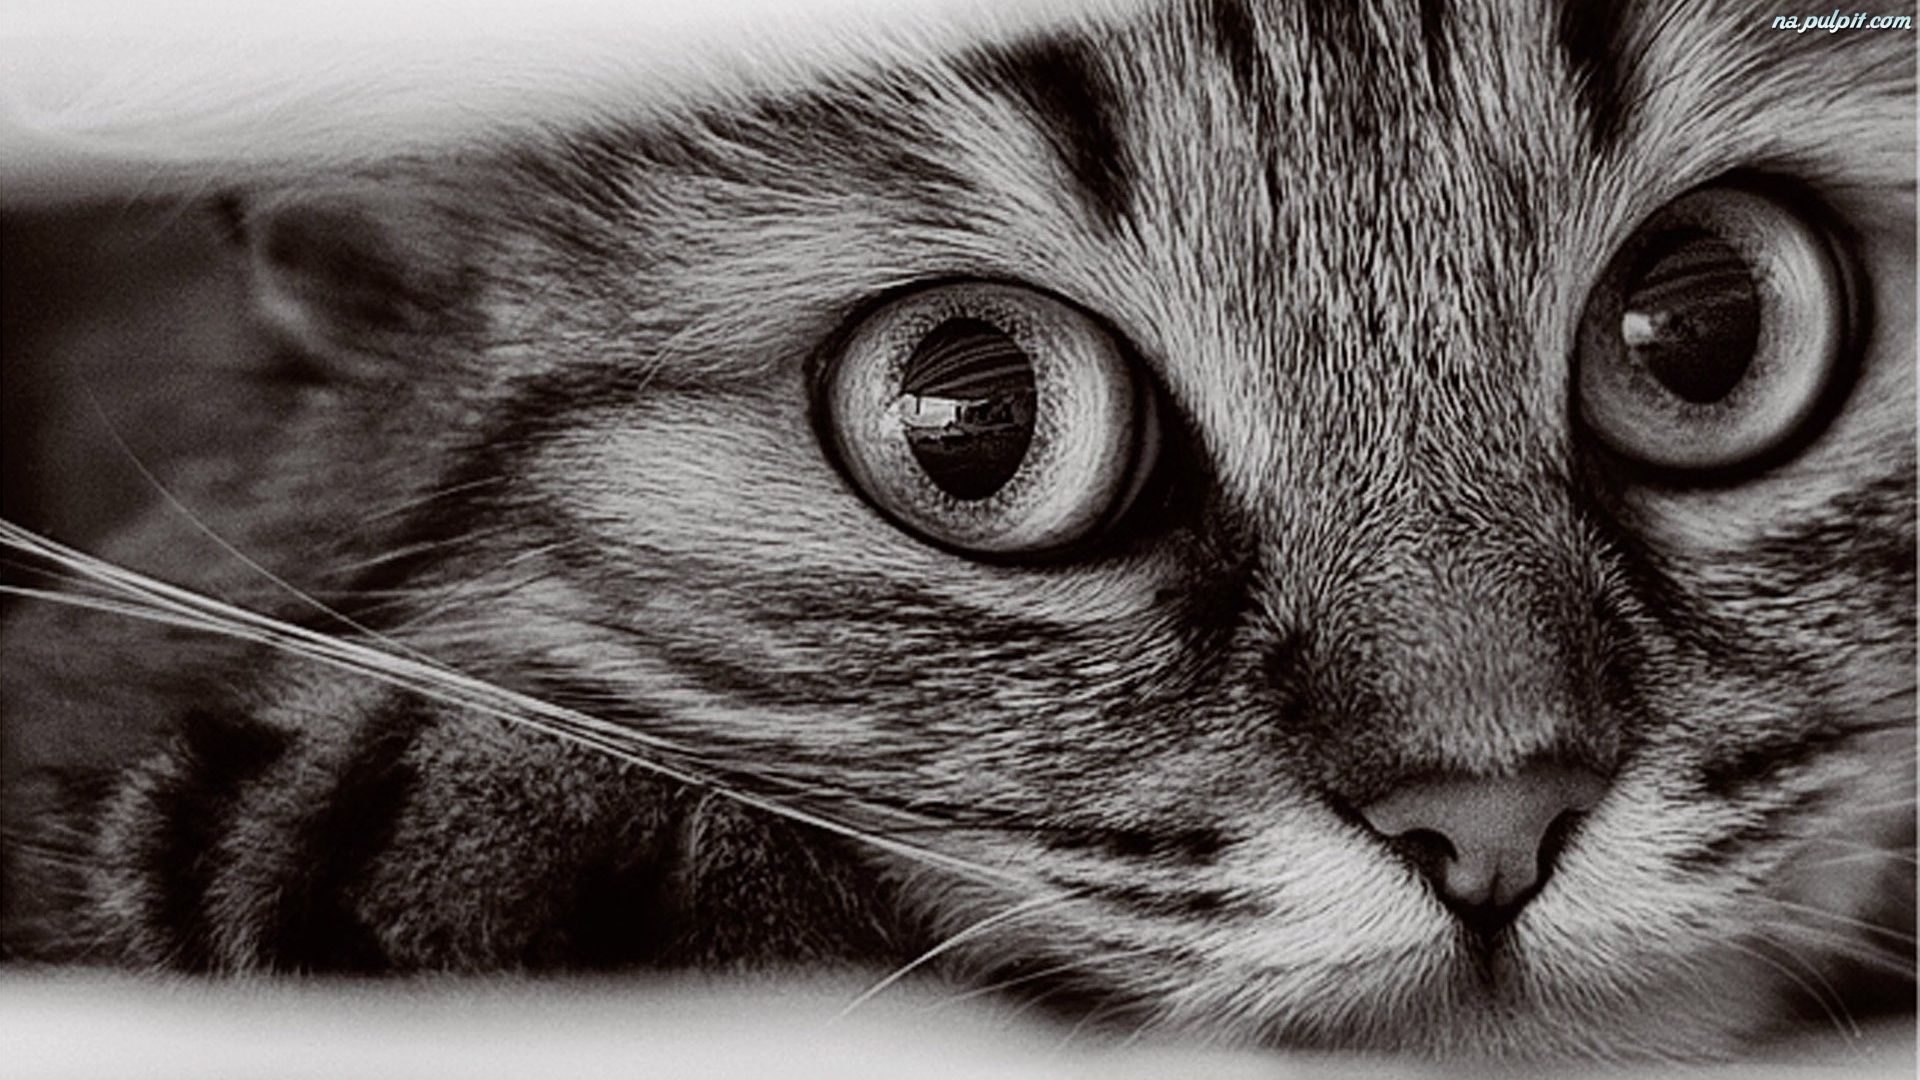 mordka-obserwacja-kotka.jpeg (1920×1080)